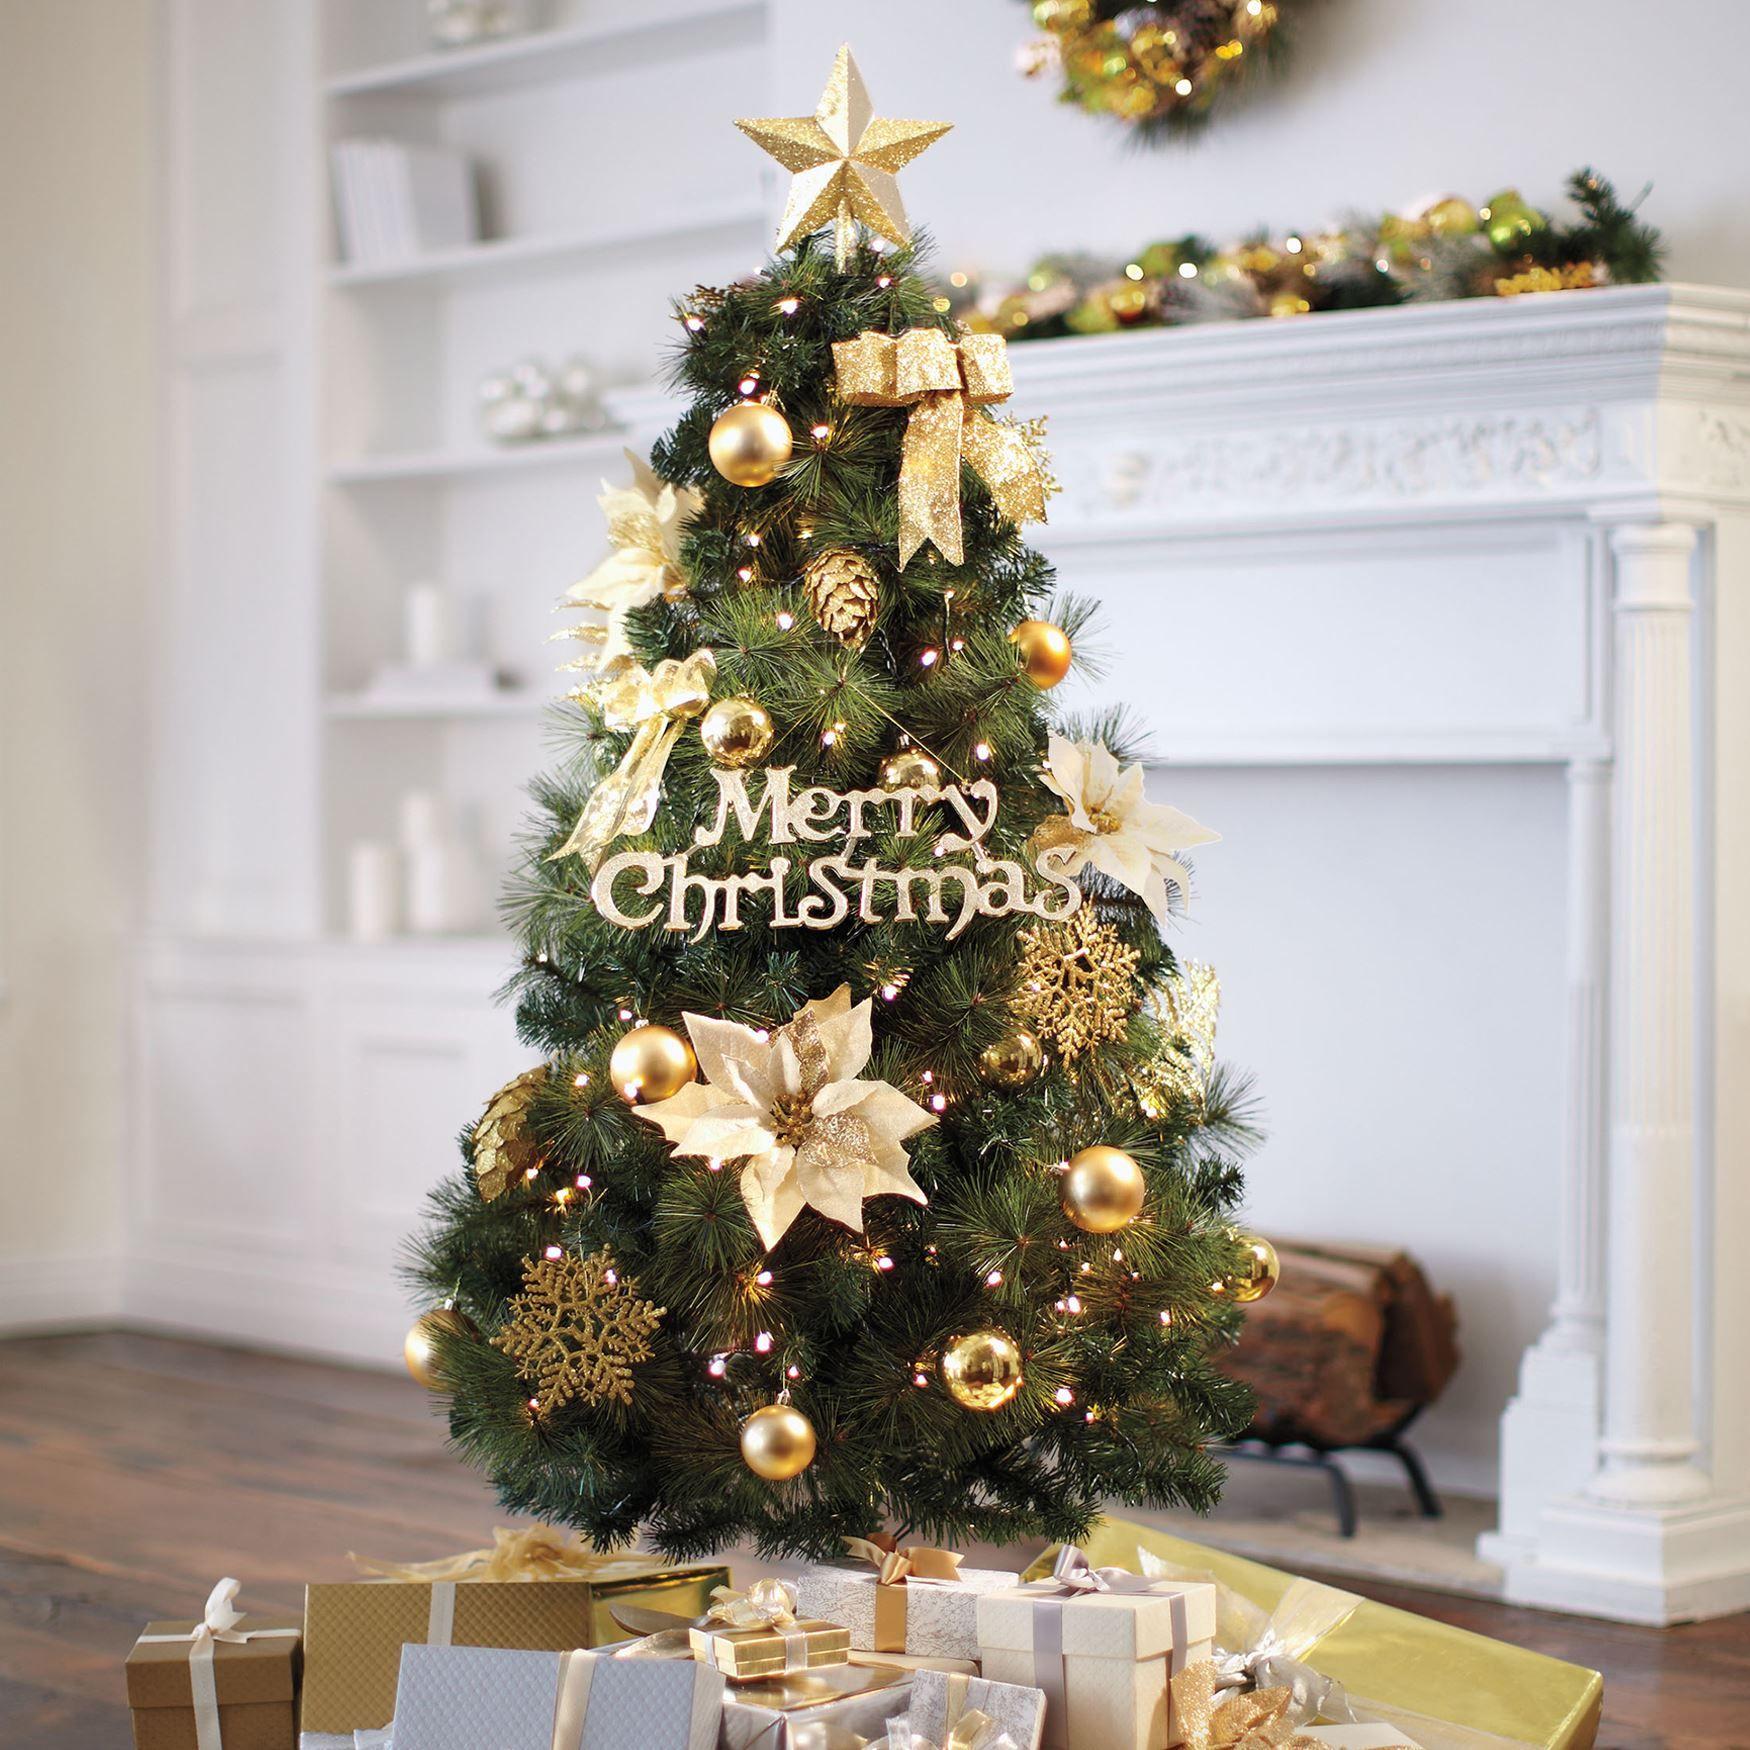 Christmas Tree Brylane Home 5Ft Poinsetta Tree